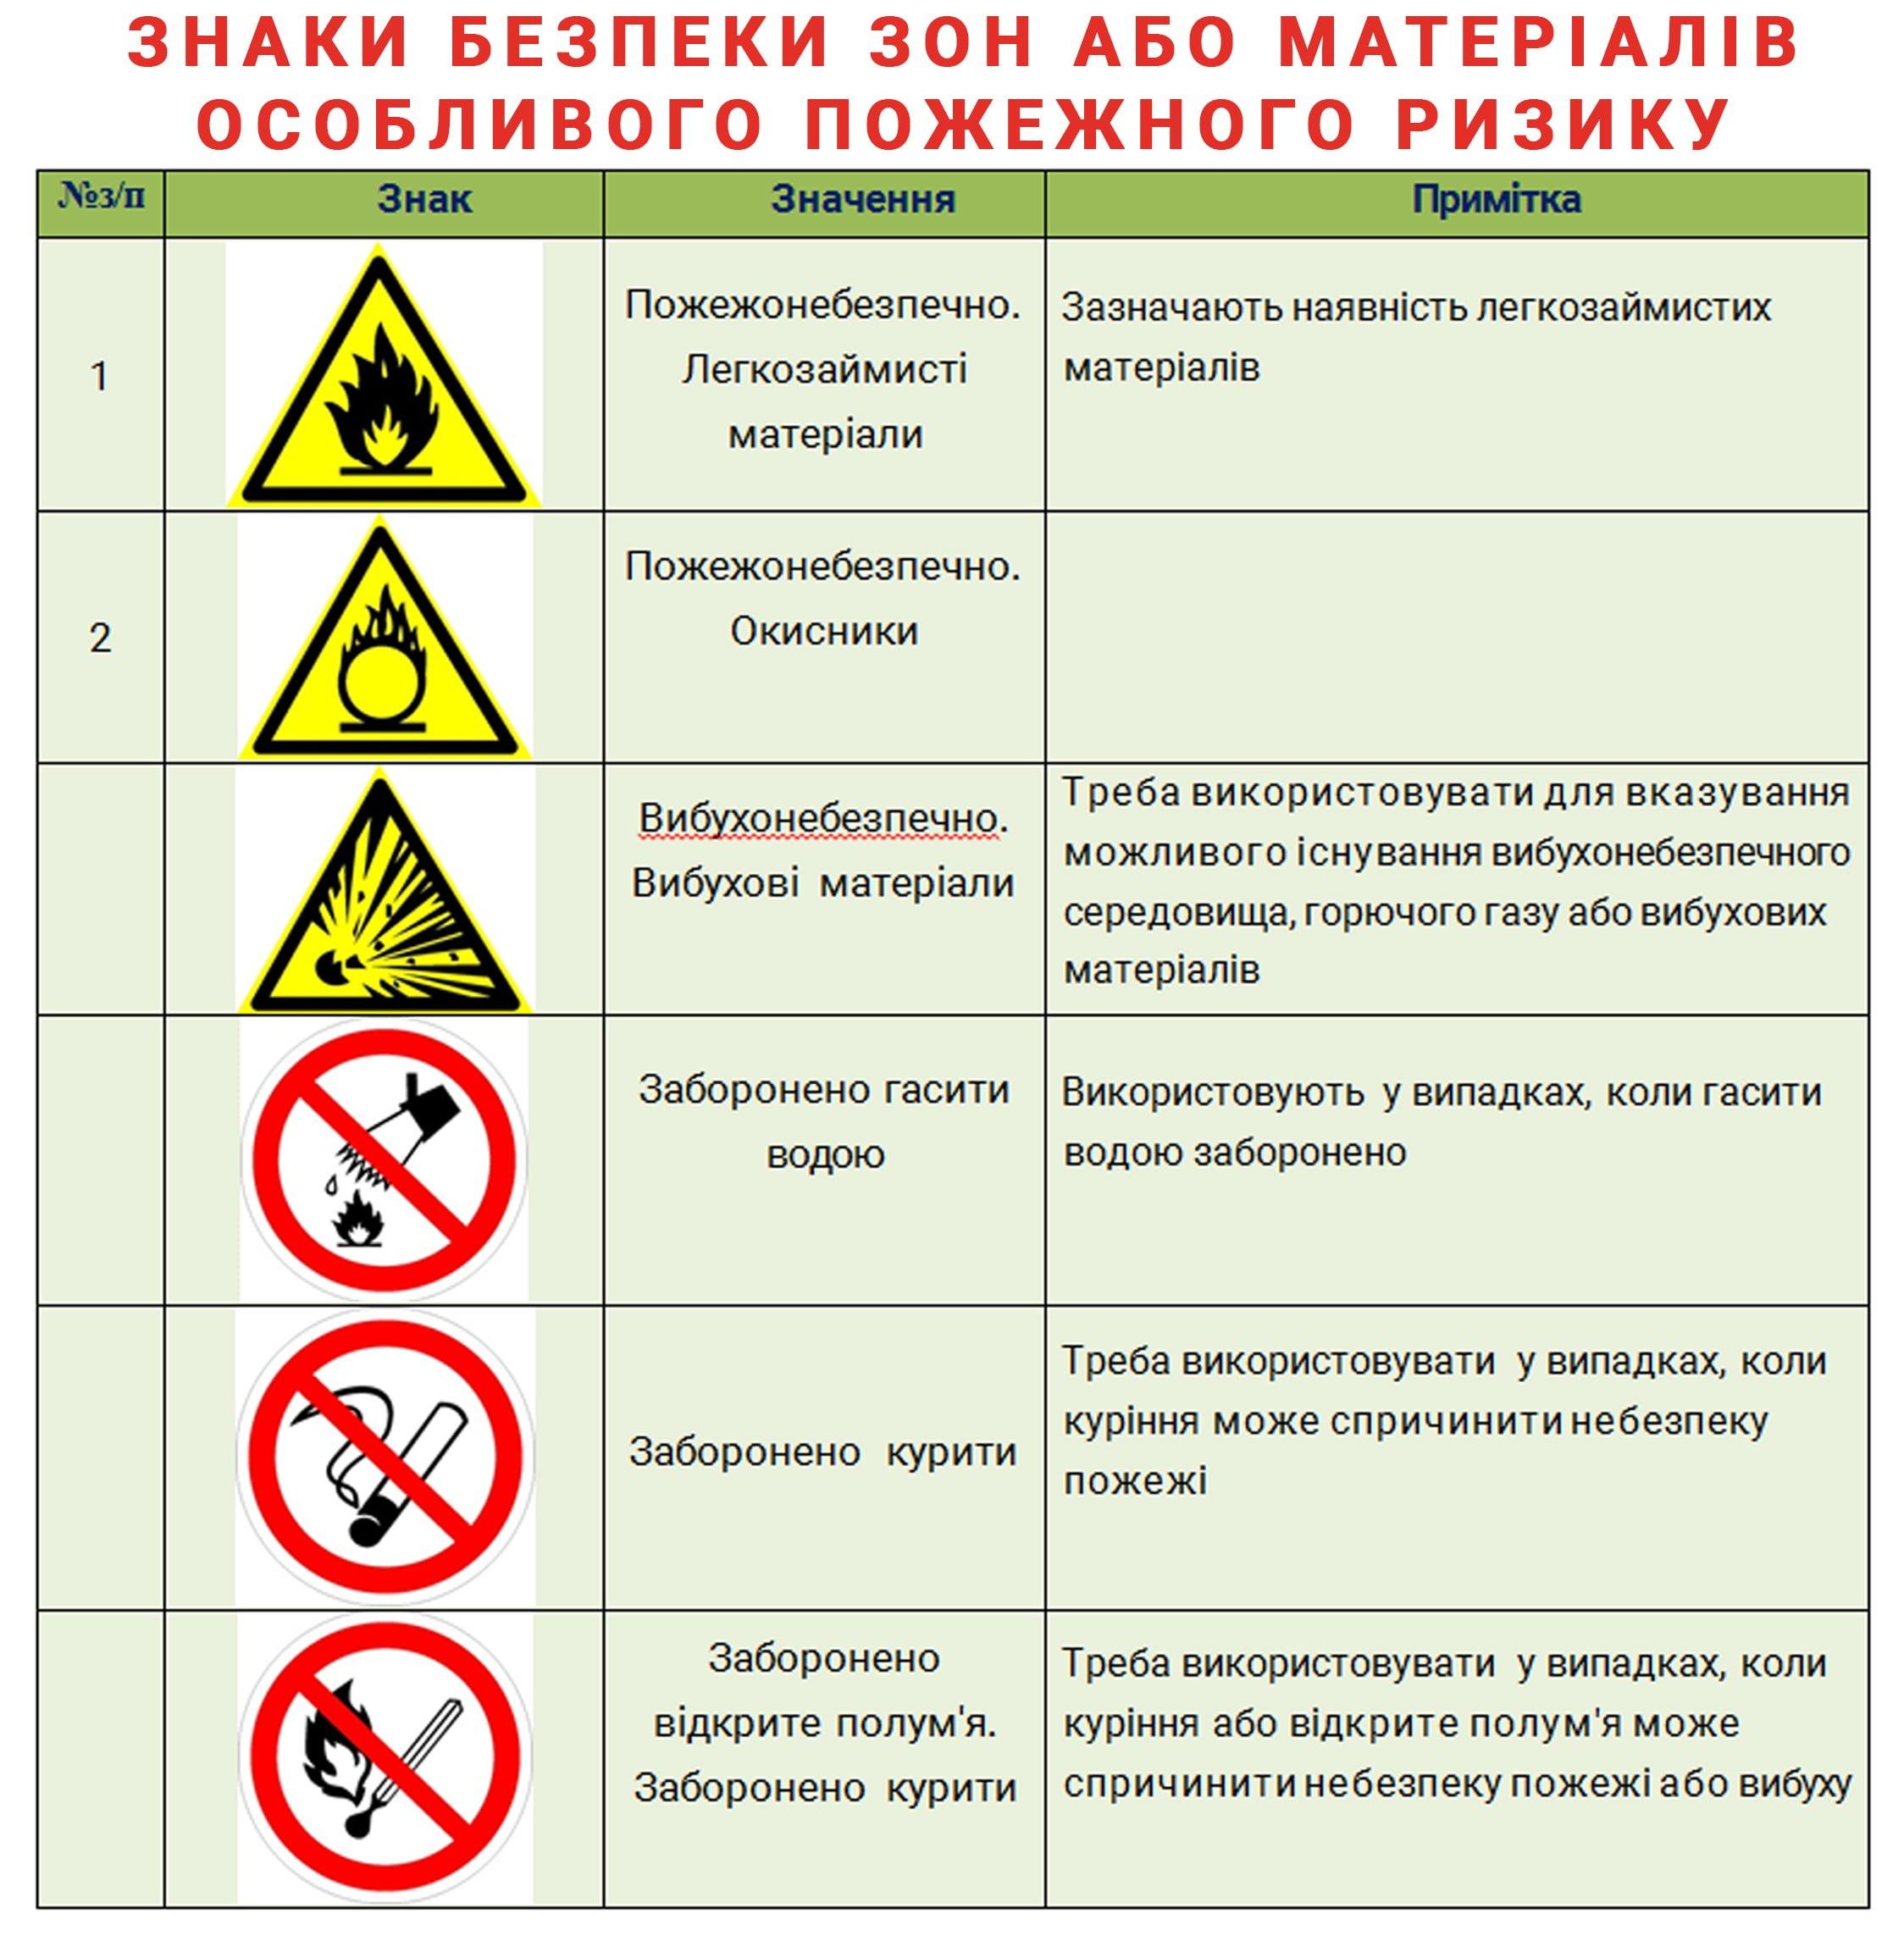 Знаки безпеки. Зони або матеріали особливого пожежного ризику